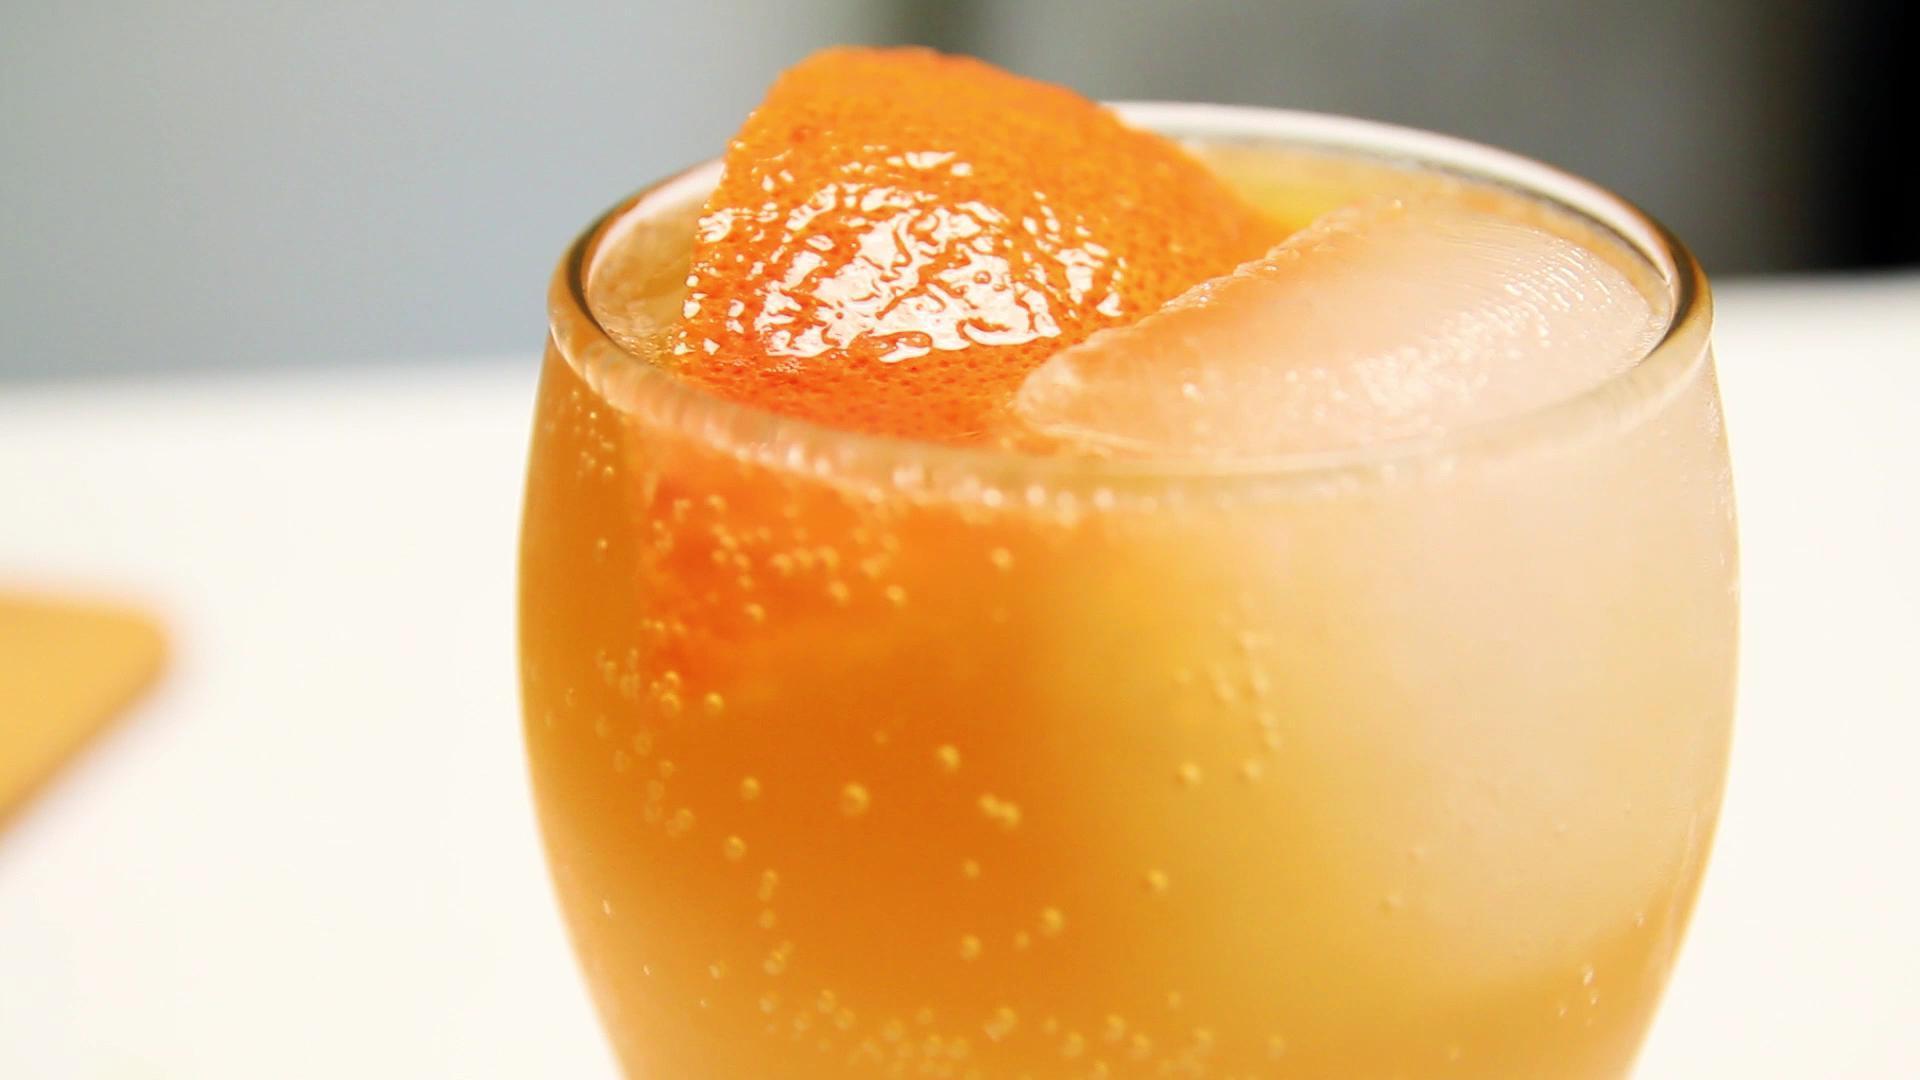 Refreshing Rum and Grapefruit Cooler Recipe